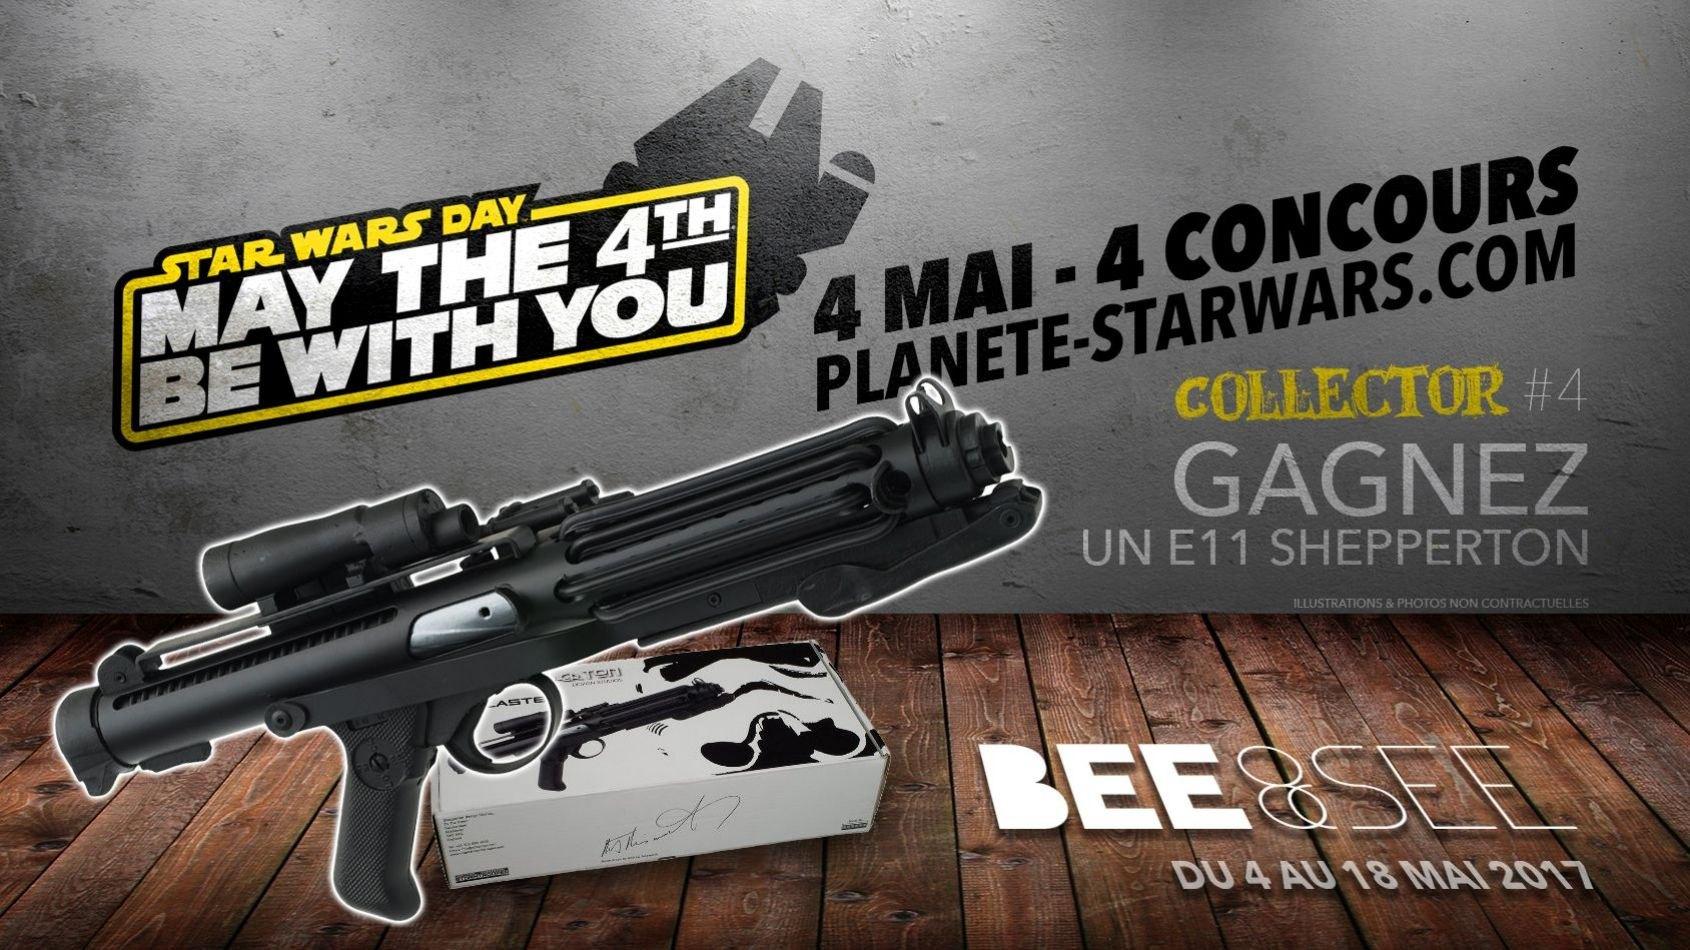 4 Mai 4 Concours #4 - COLLECTOR - Gagnez un blaster de Stormtrooper !